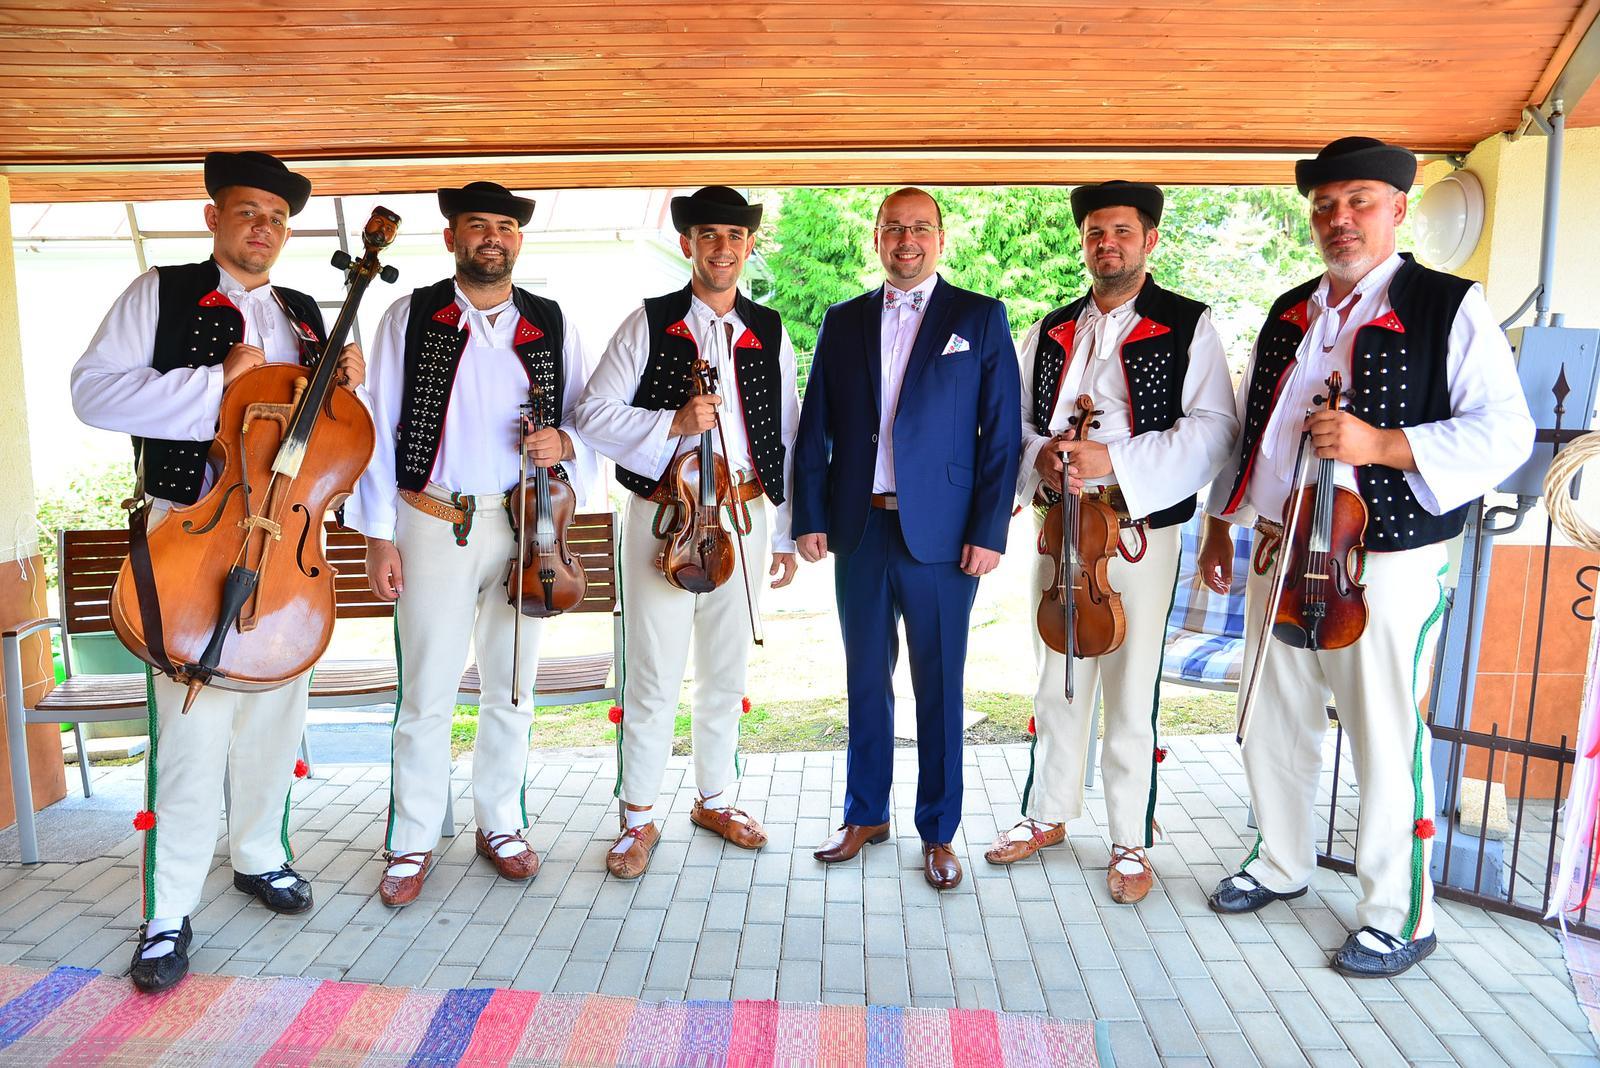 Folklorna svadba M+M, 24.8.2019 Turany - Folklorna svadba M+M, 24.8.2019 Turany, autor Foto: Multimediálny DJ Maroš Chvojka 010